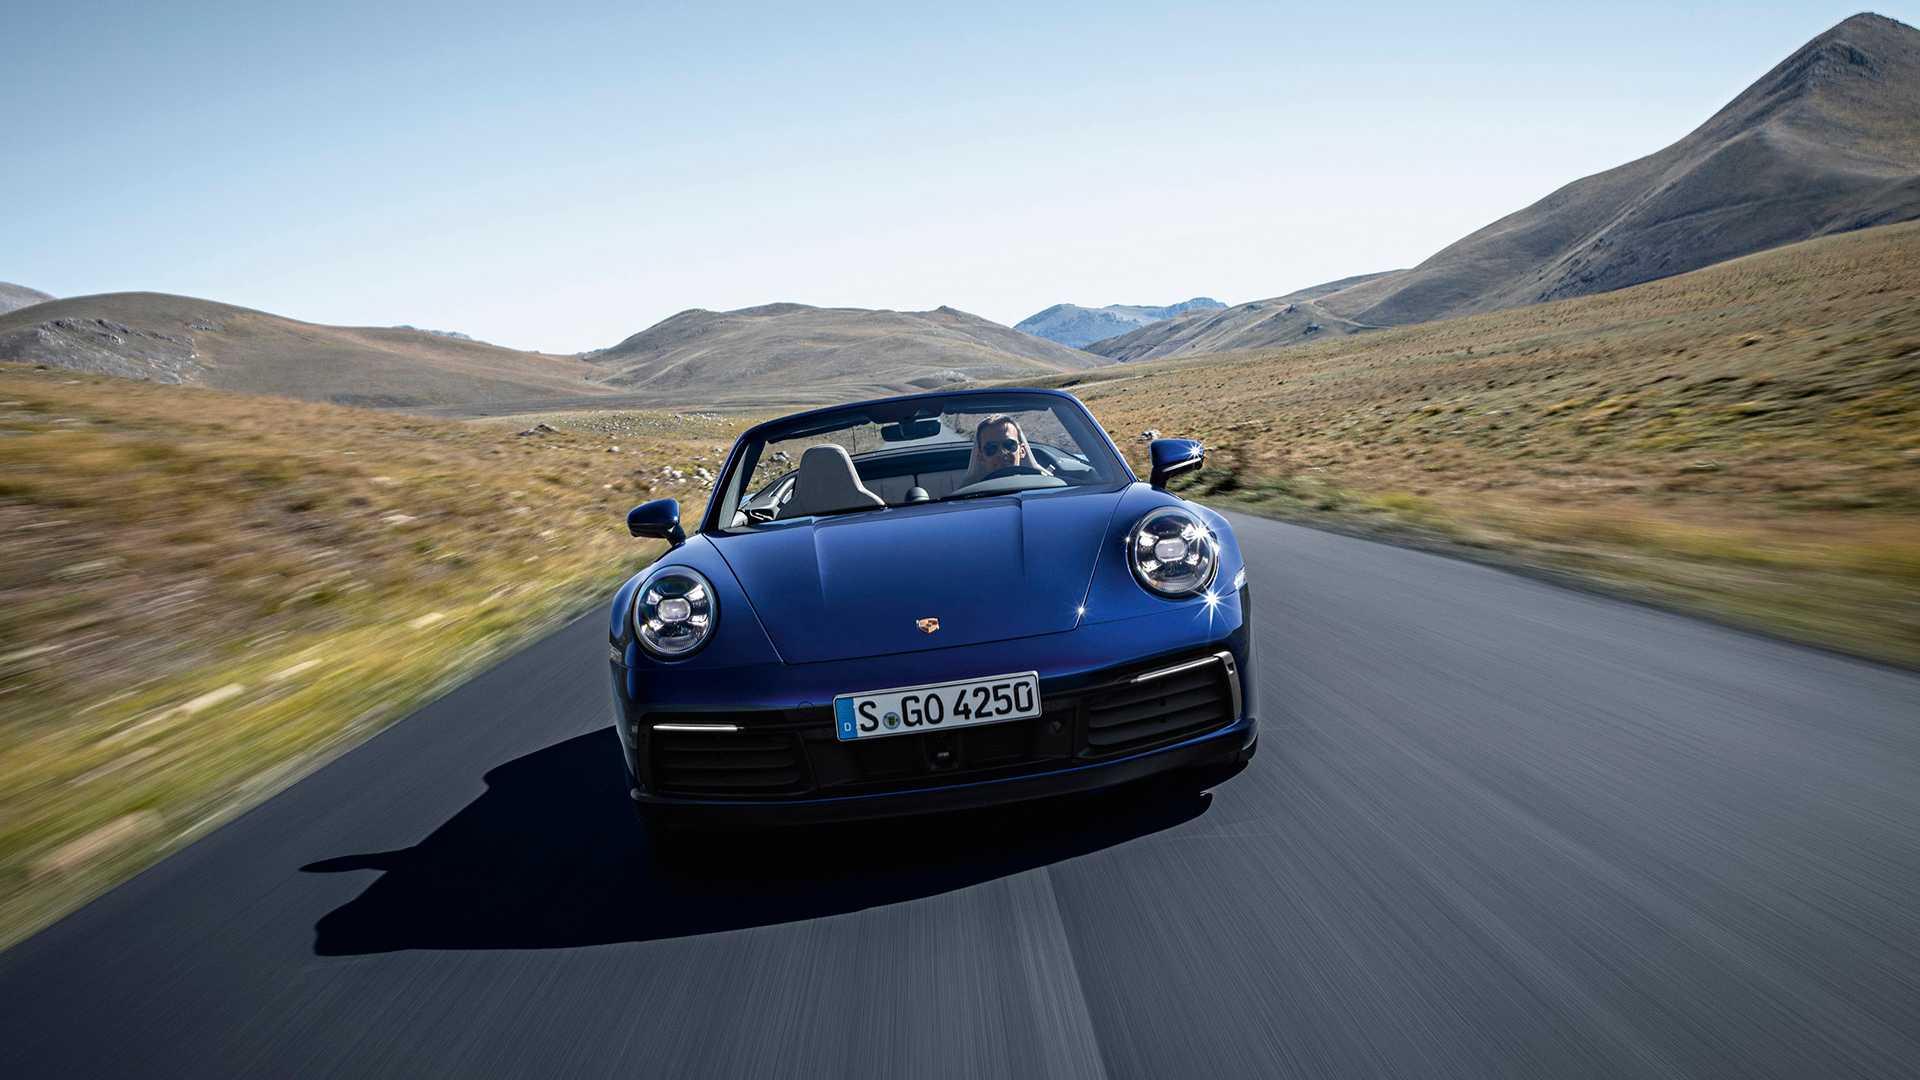 2020-porsche-911-cabriolet-trinh-lang-7.jpg